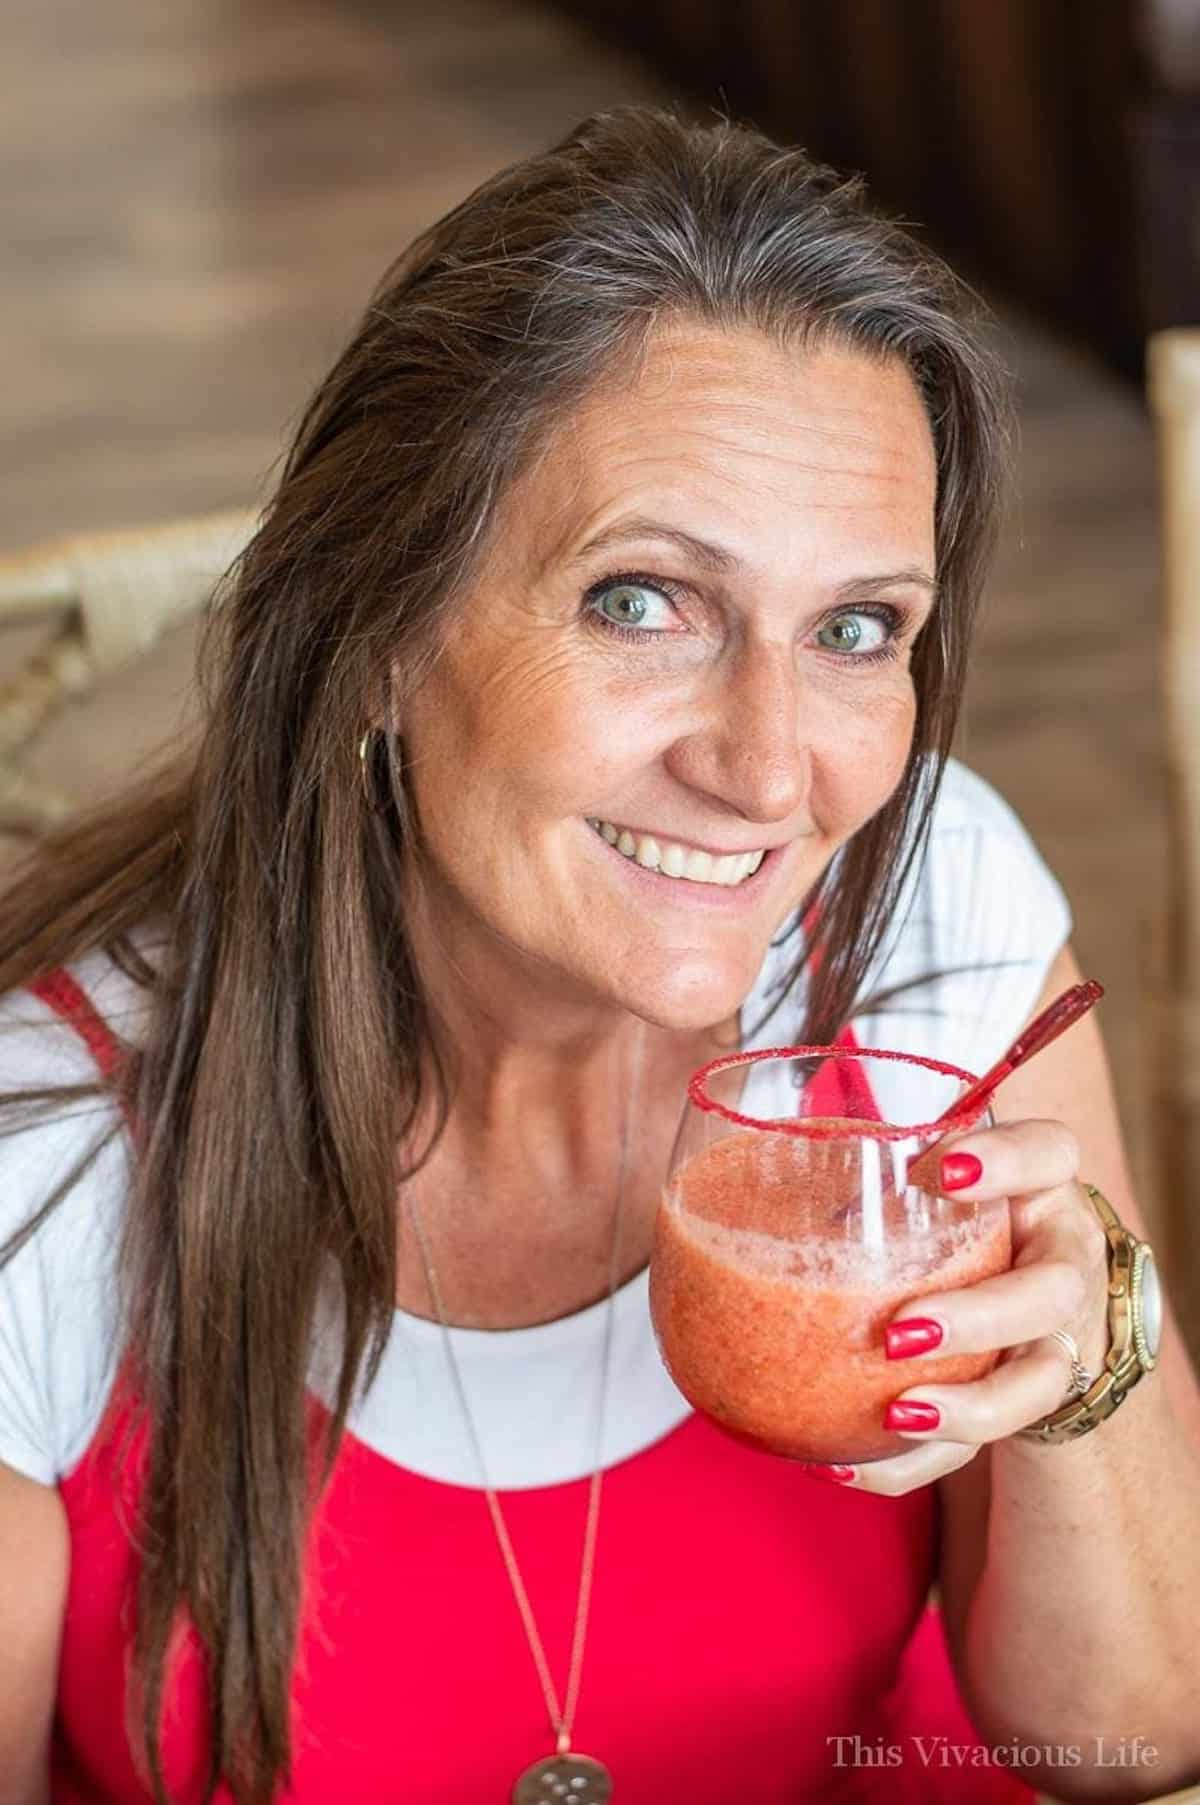 Virgin Strawberry Margarita Mocktail in a woman's hand